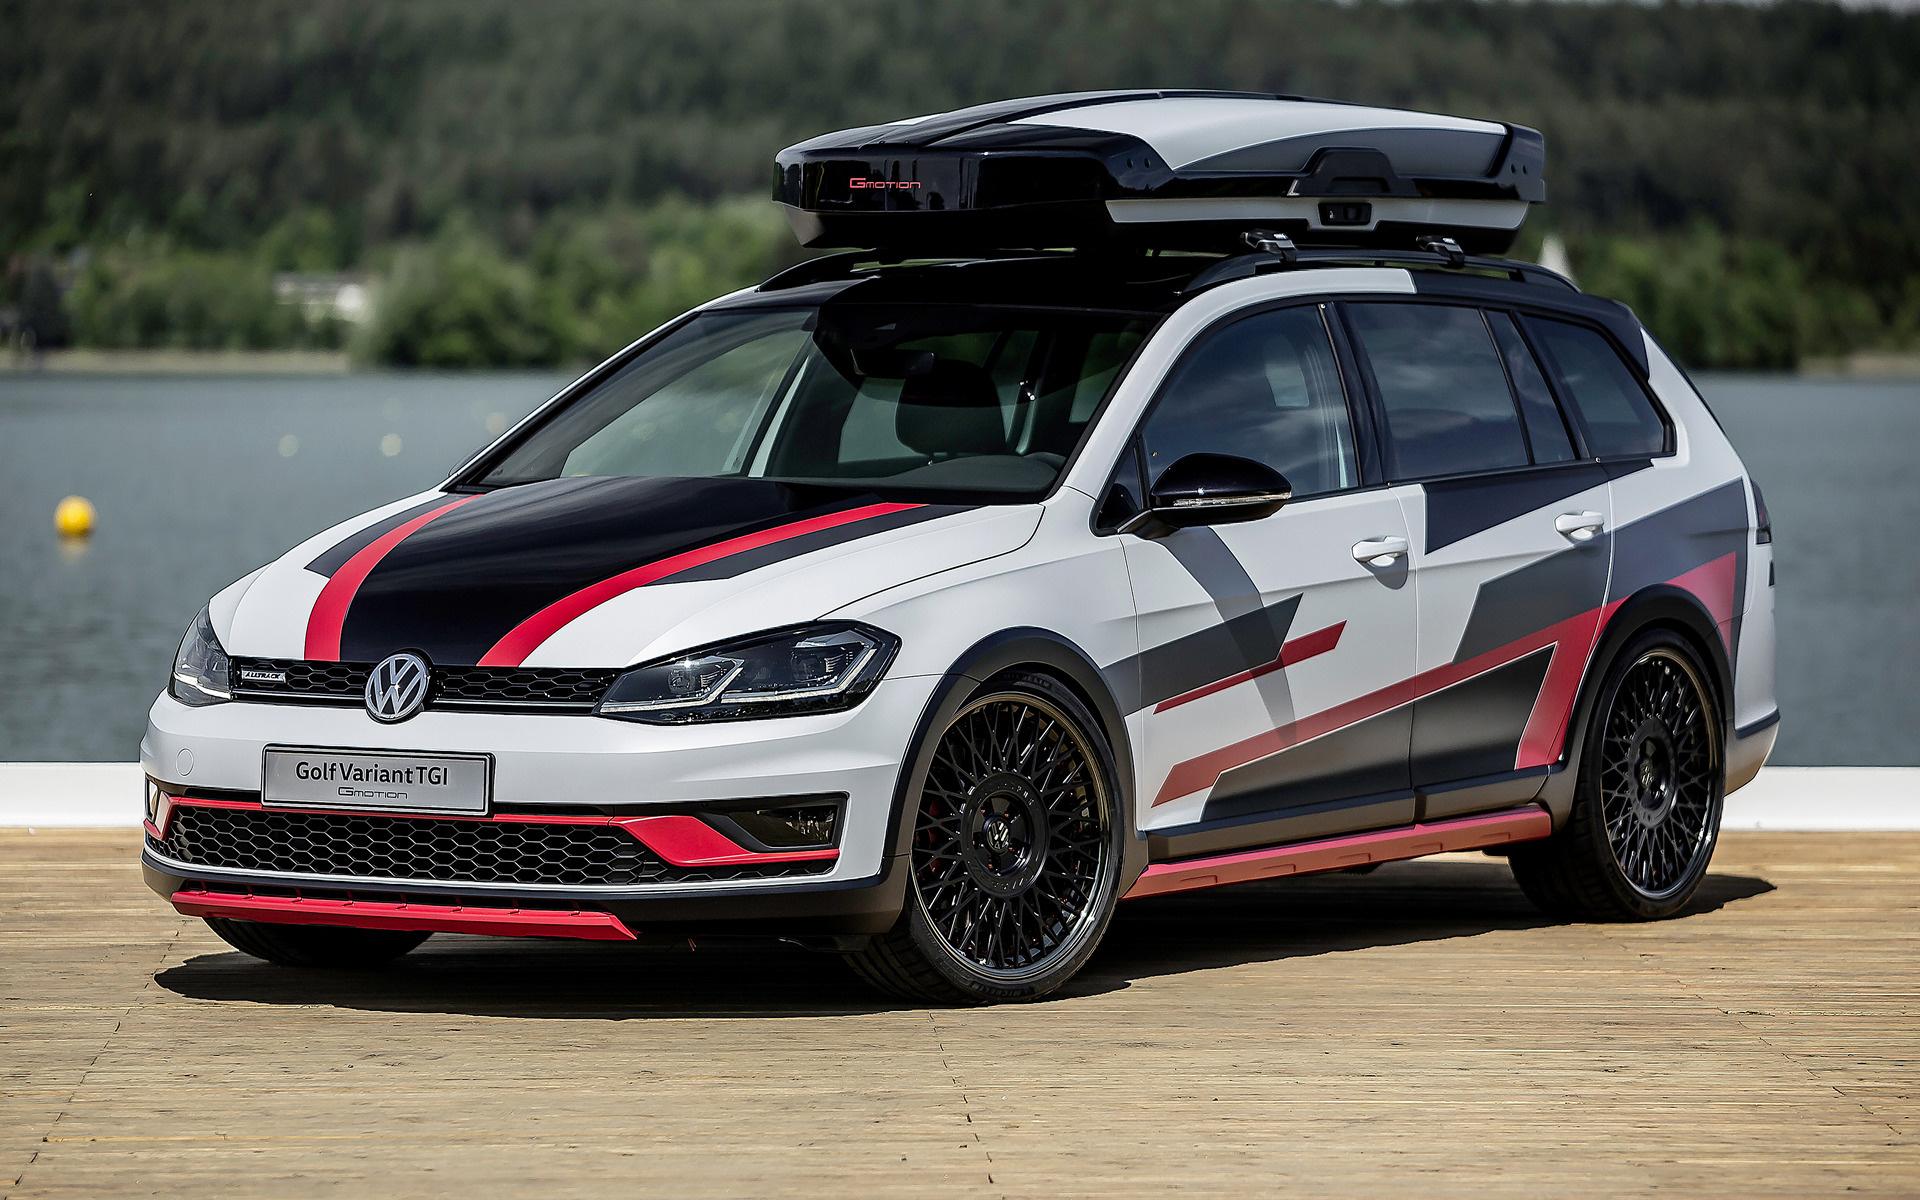 2018 Volkswagen Golf Variant Alltrack Tgi Gmotion Concept